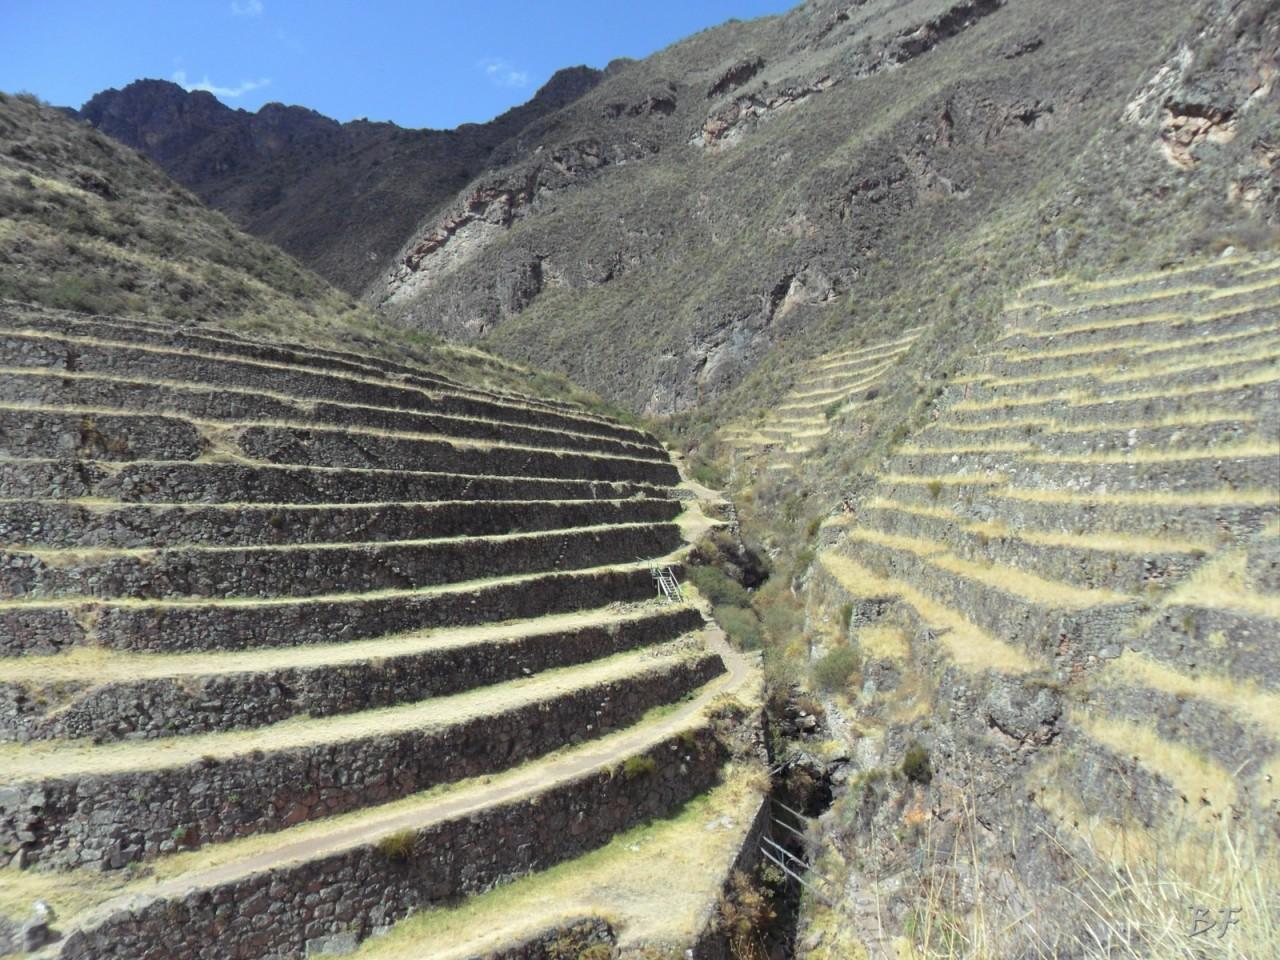 Mura-Poligonali-Megaliti-Altari-Rupestri-Pisac-Cusco-Perù-88